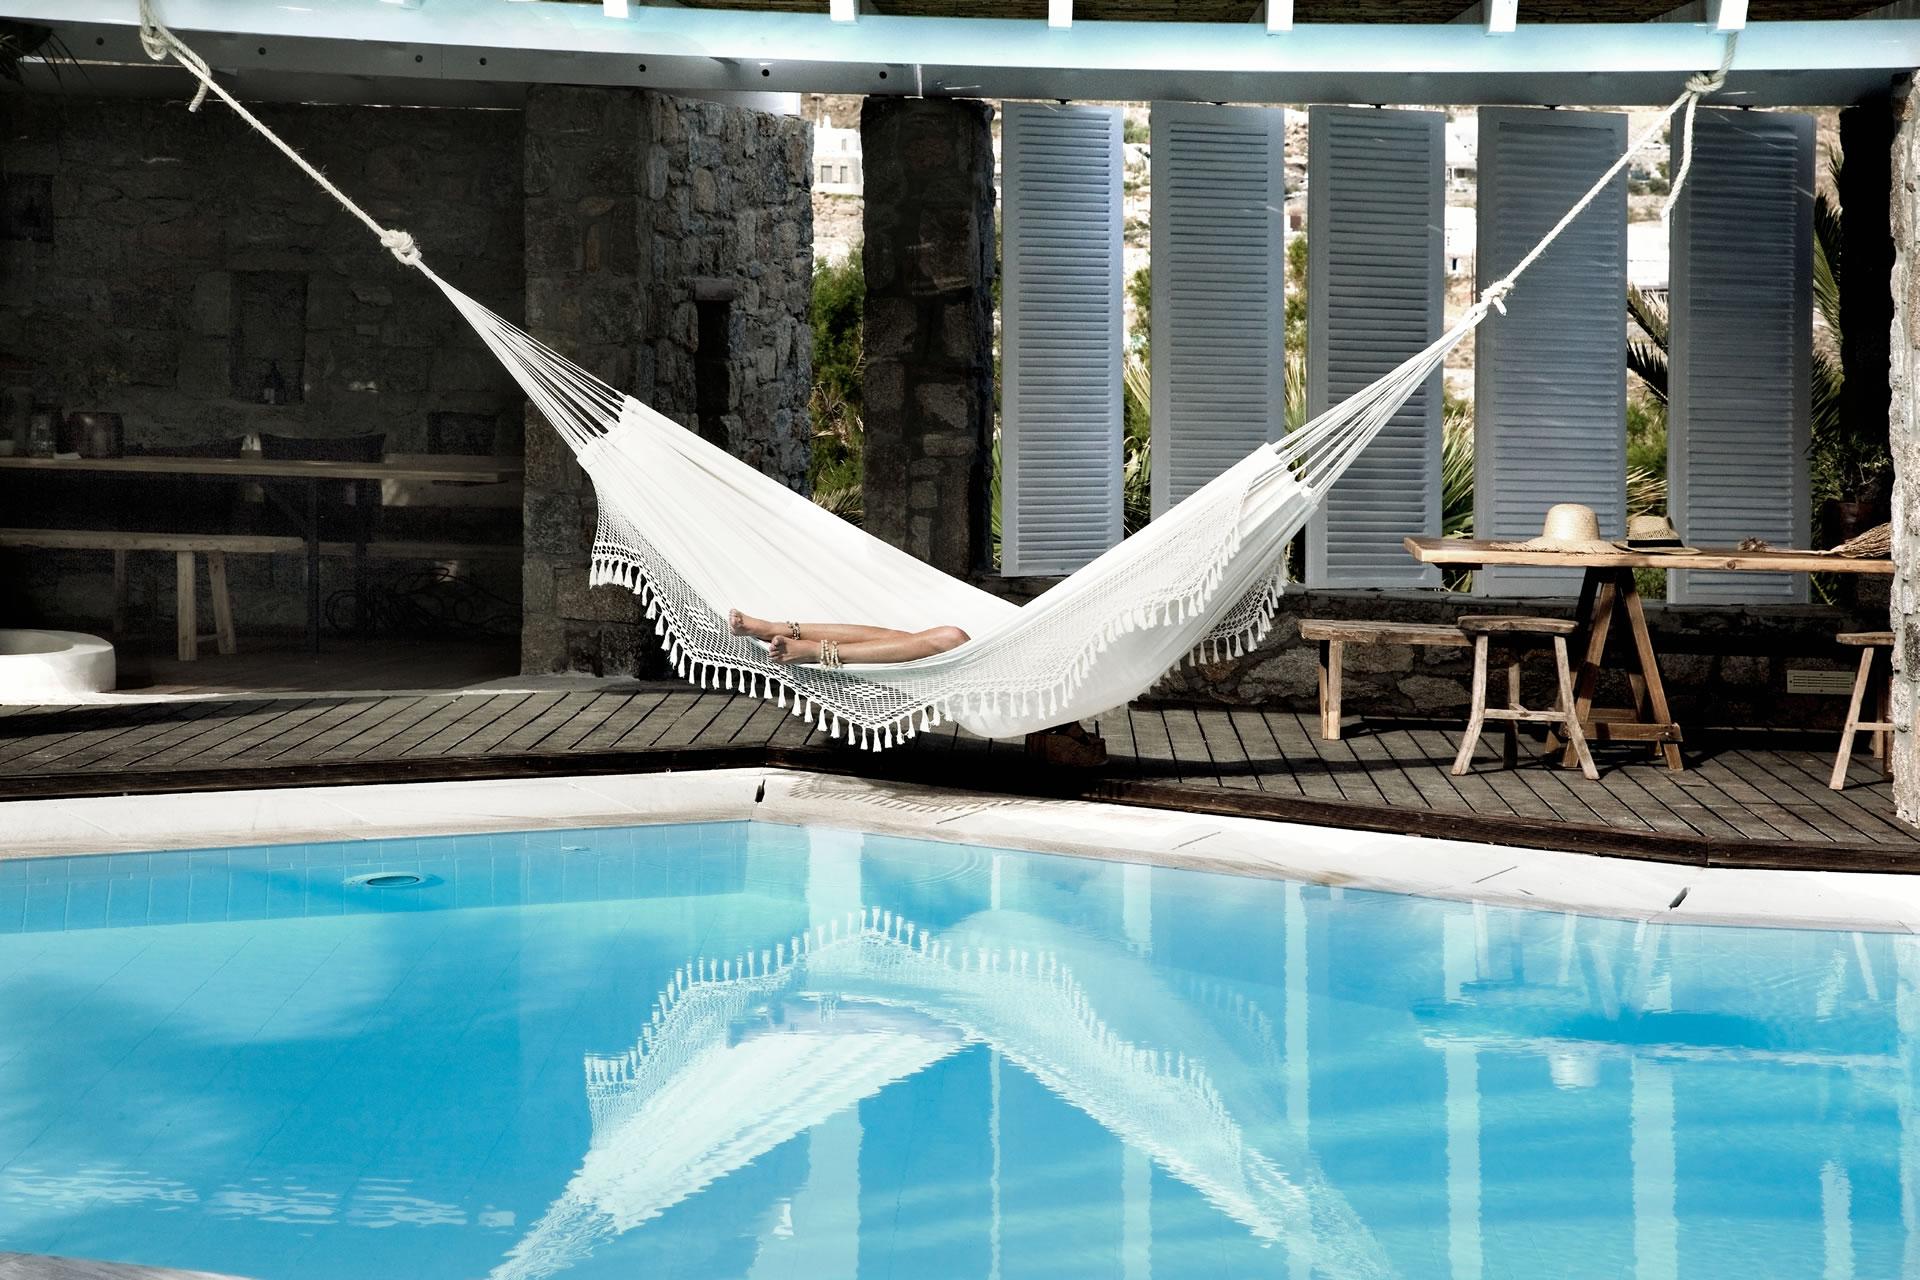 san giorgio designer hotel in mykonos mit charme. Black Bedroom Furniture Sets. Home Design Ideas